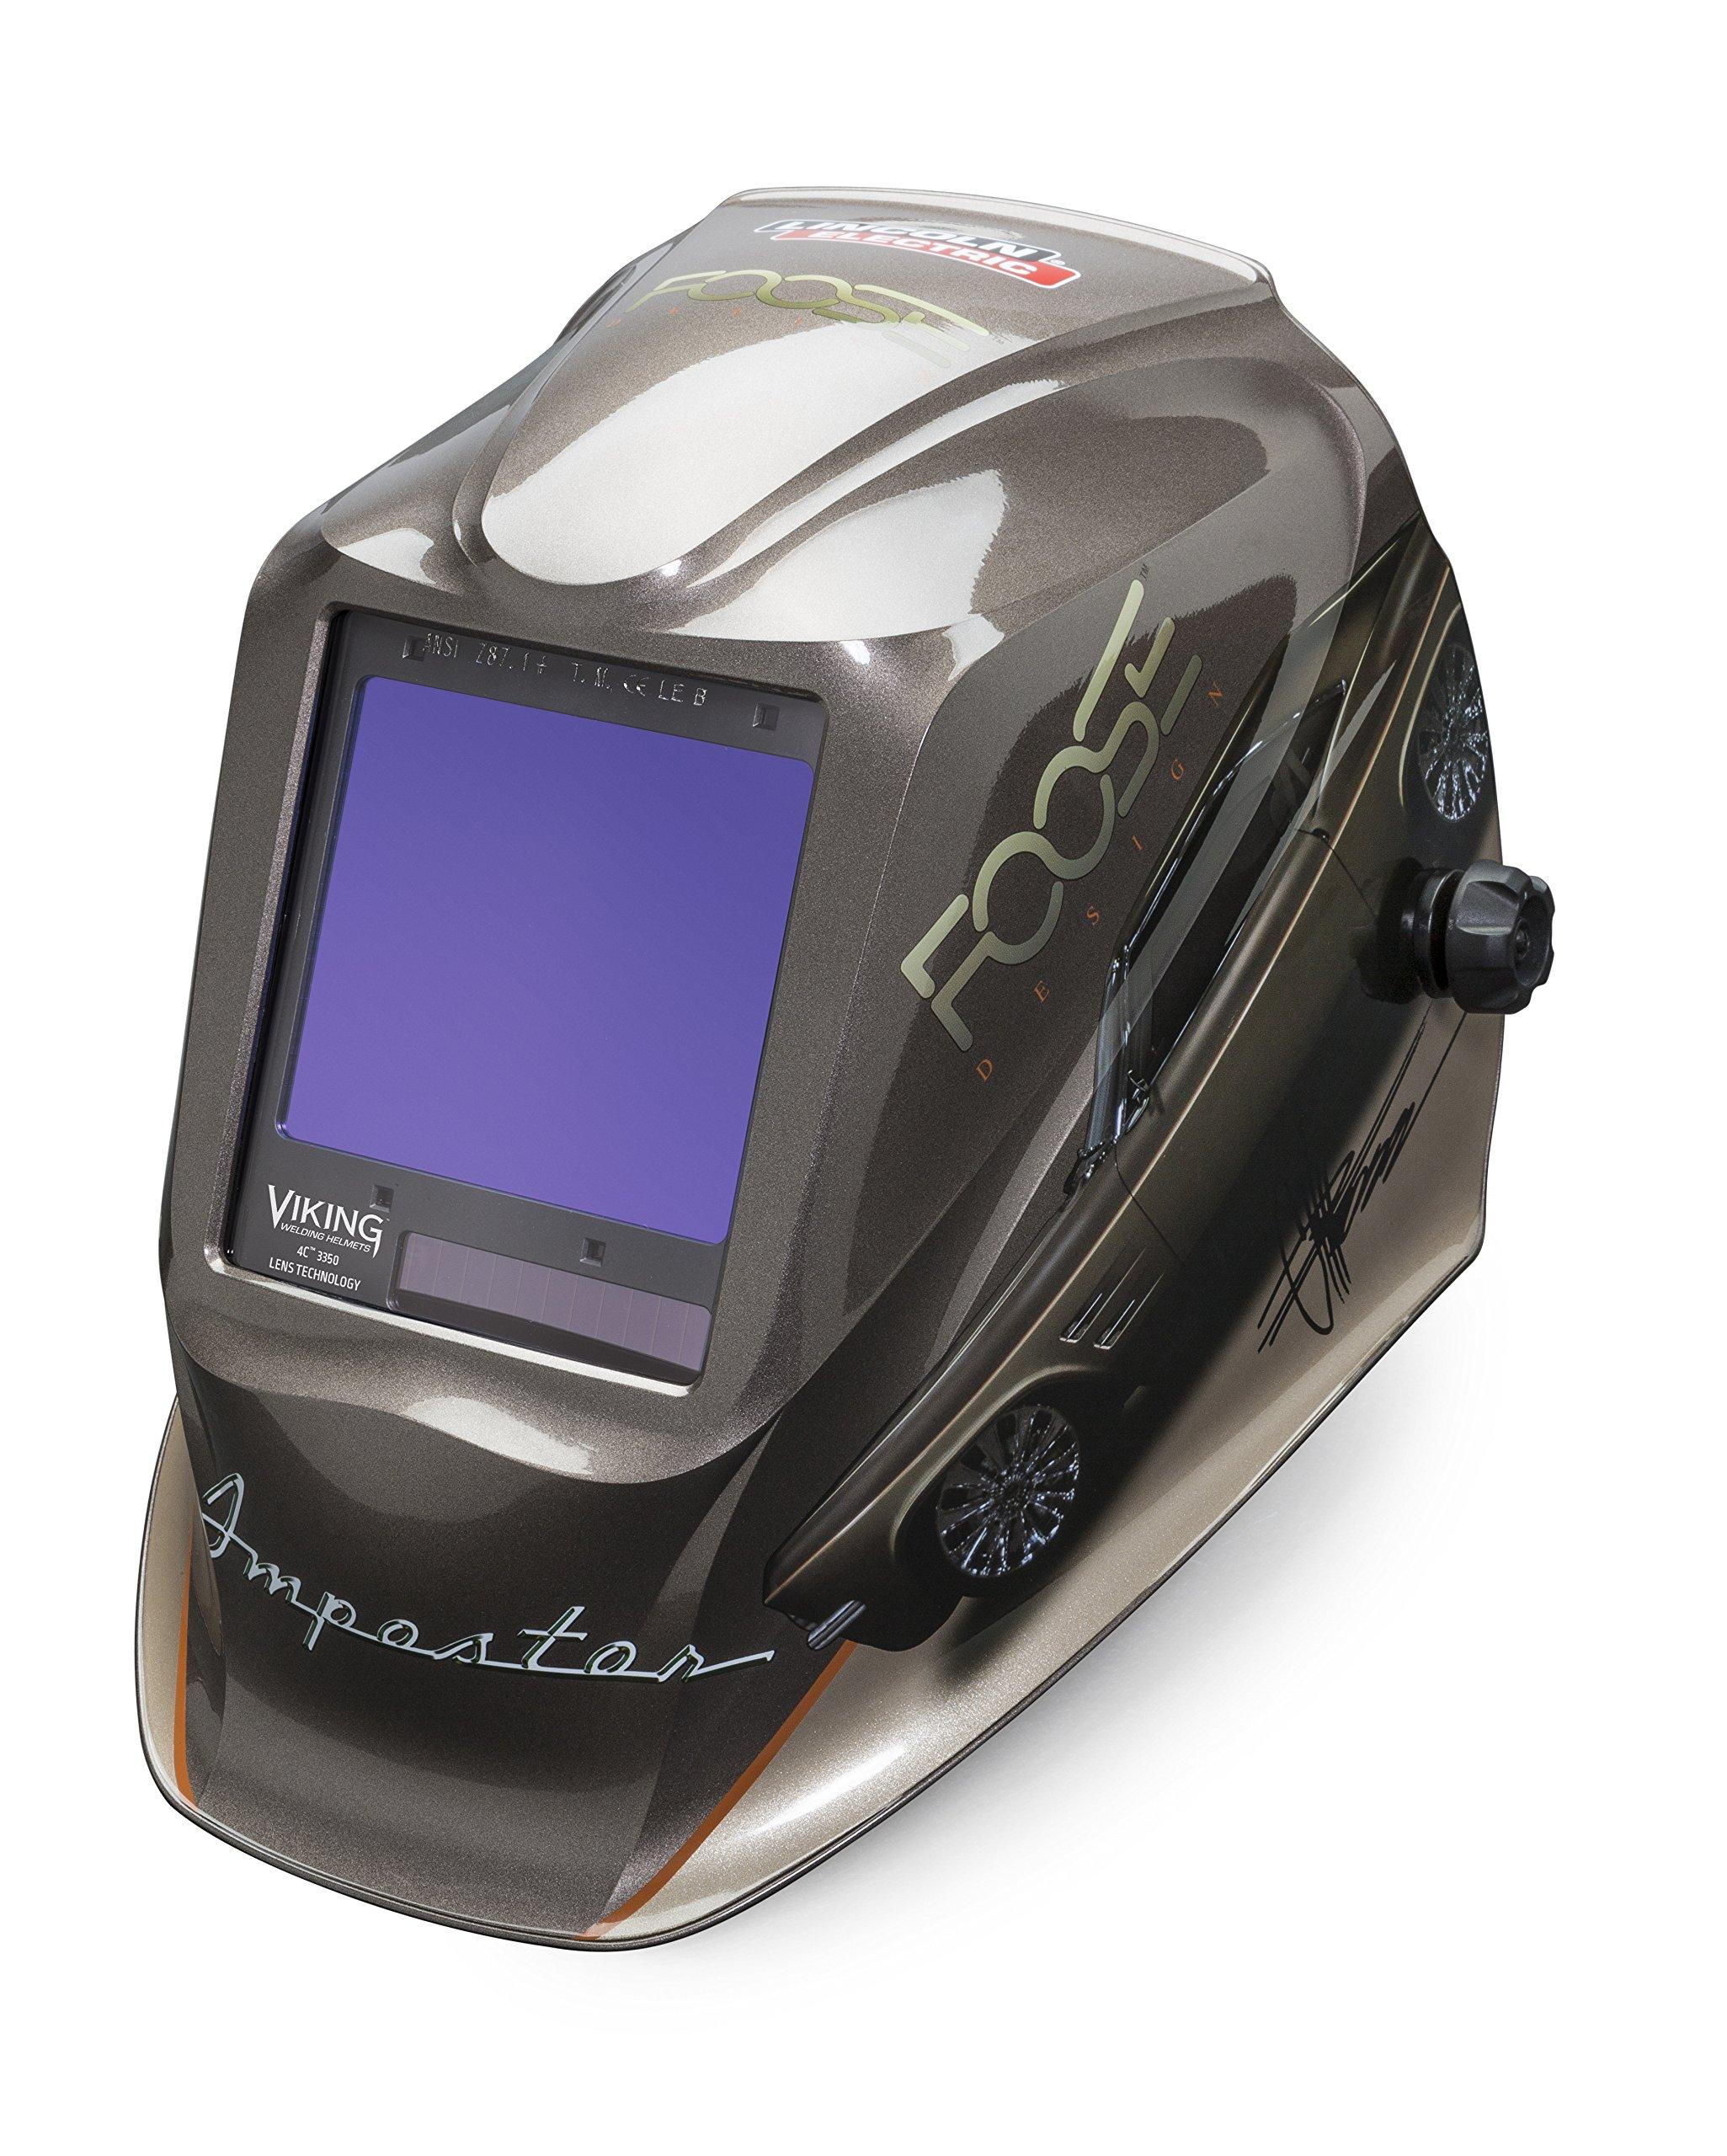 Lincoln Electric VIKING 3350 Impostor Welding Helmet with 4C Lens Technology - K4181-3